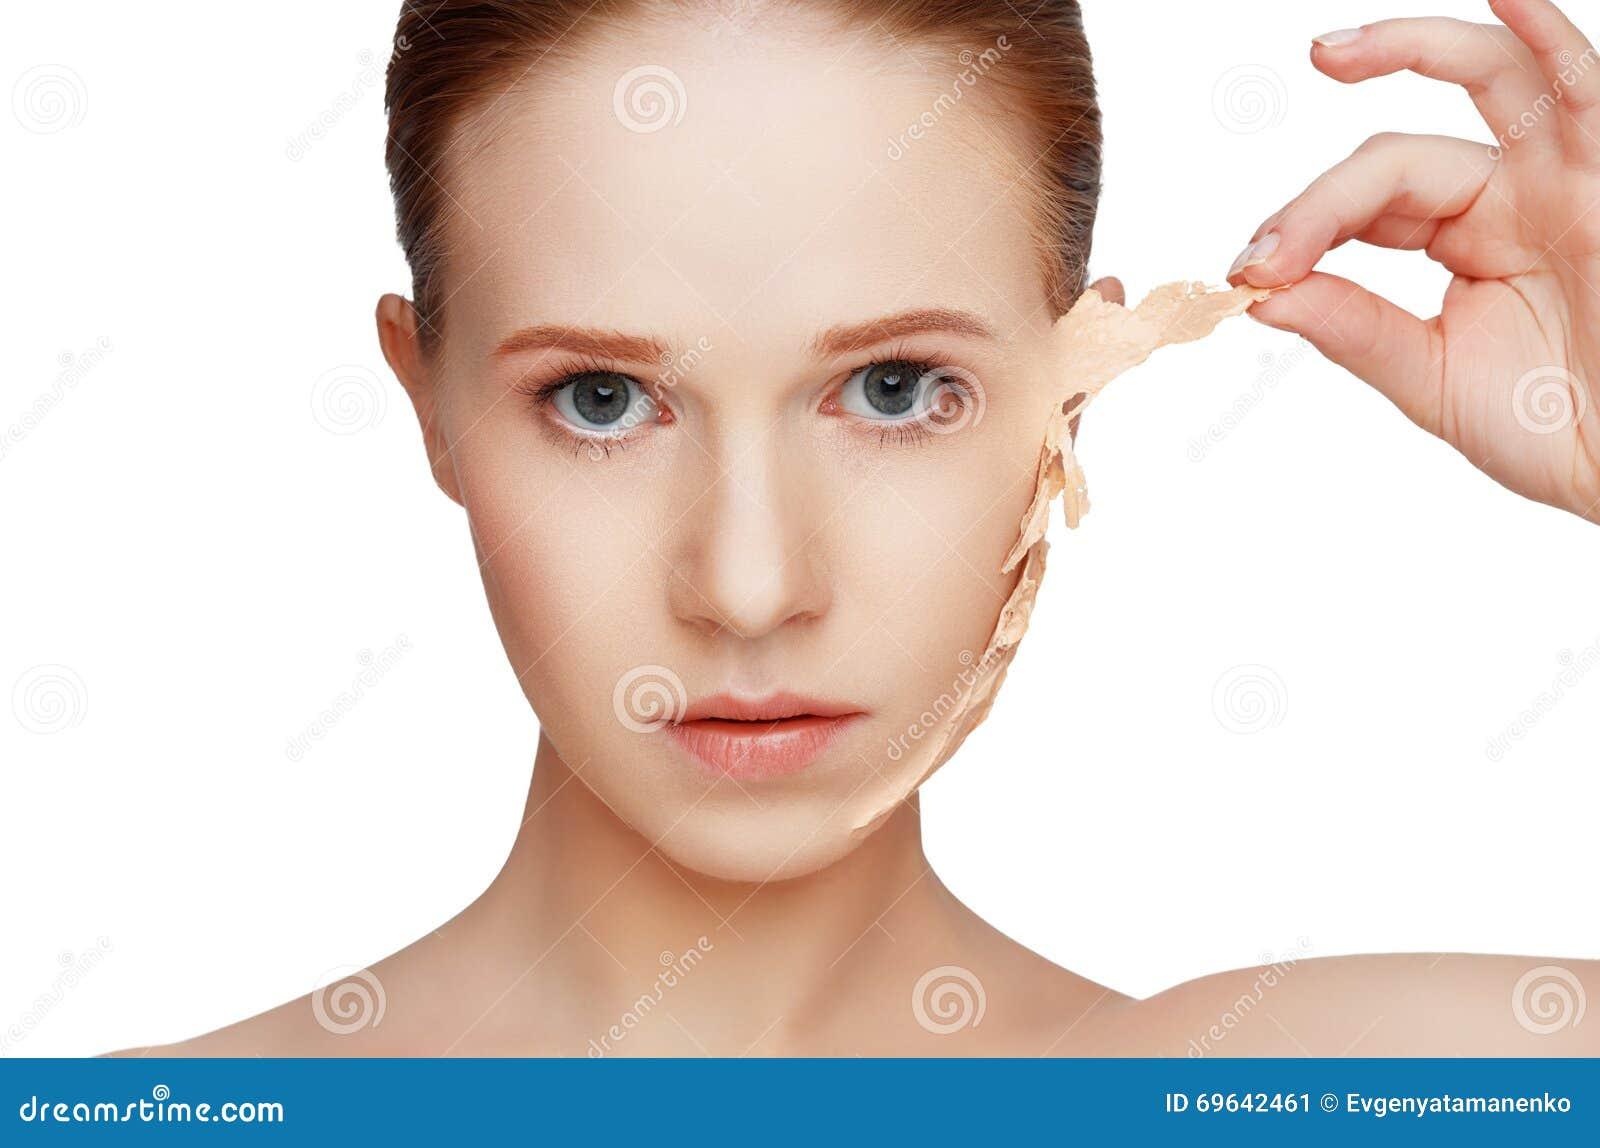 Rejuvenation skin care